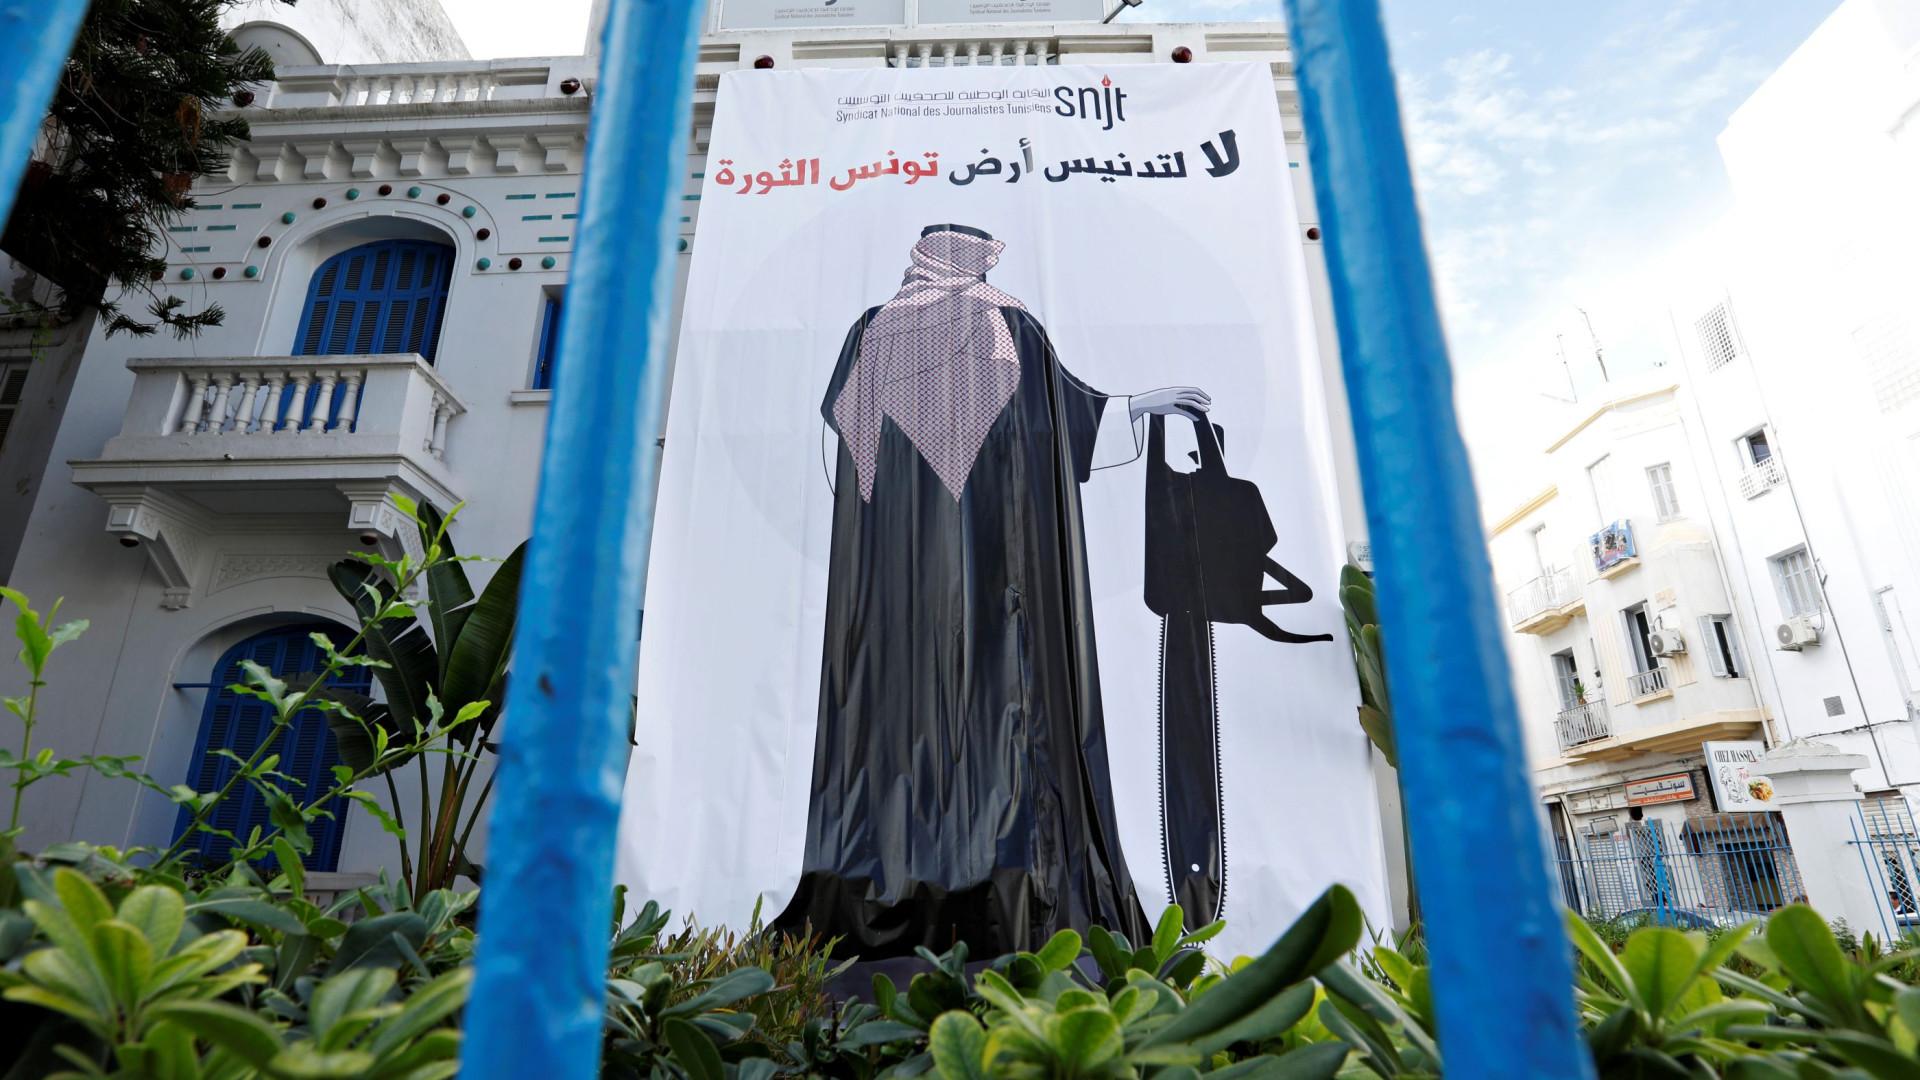 Sociedade civil tunisina contra visita do príncipe herdeiro saudita